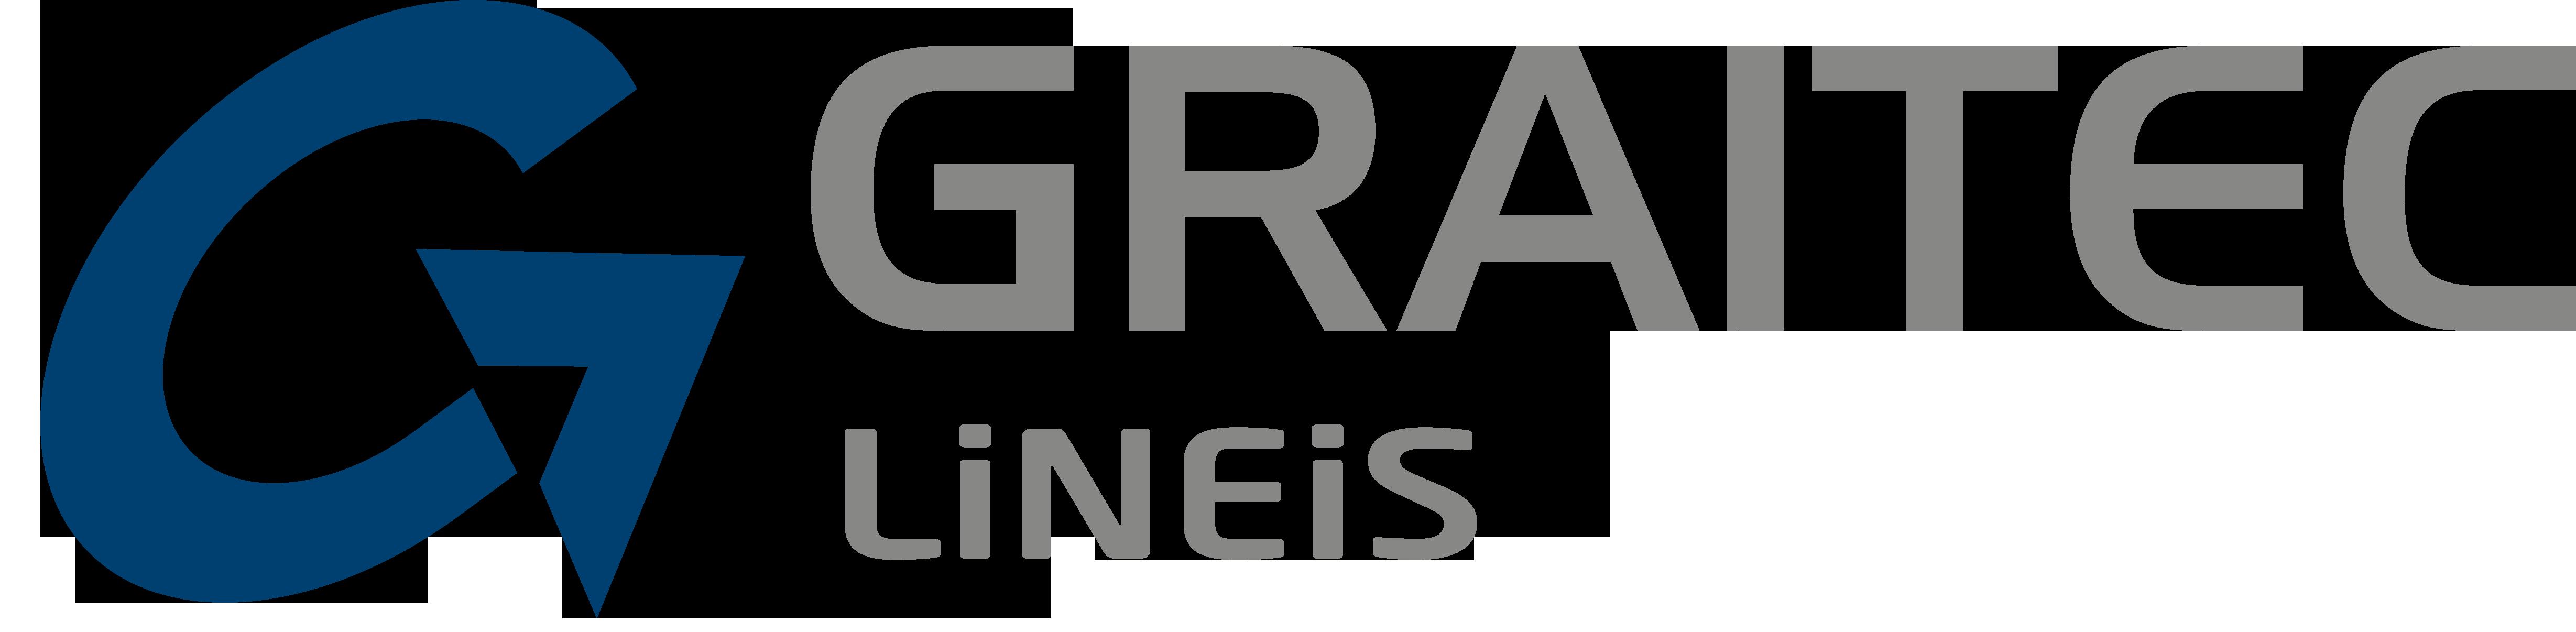 logo GRAITEC LINEIS